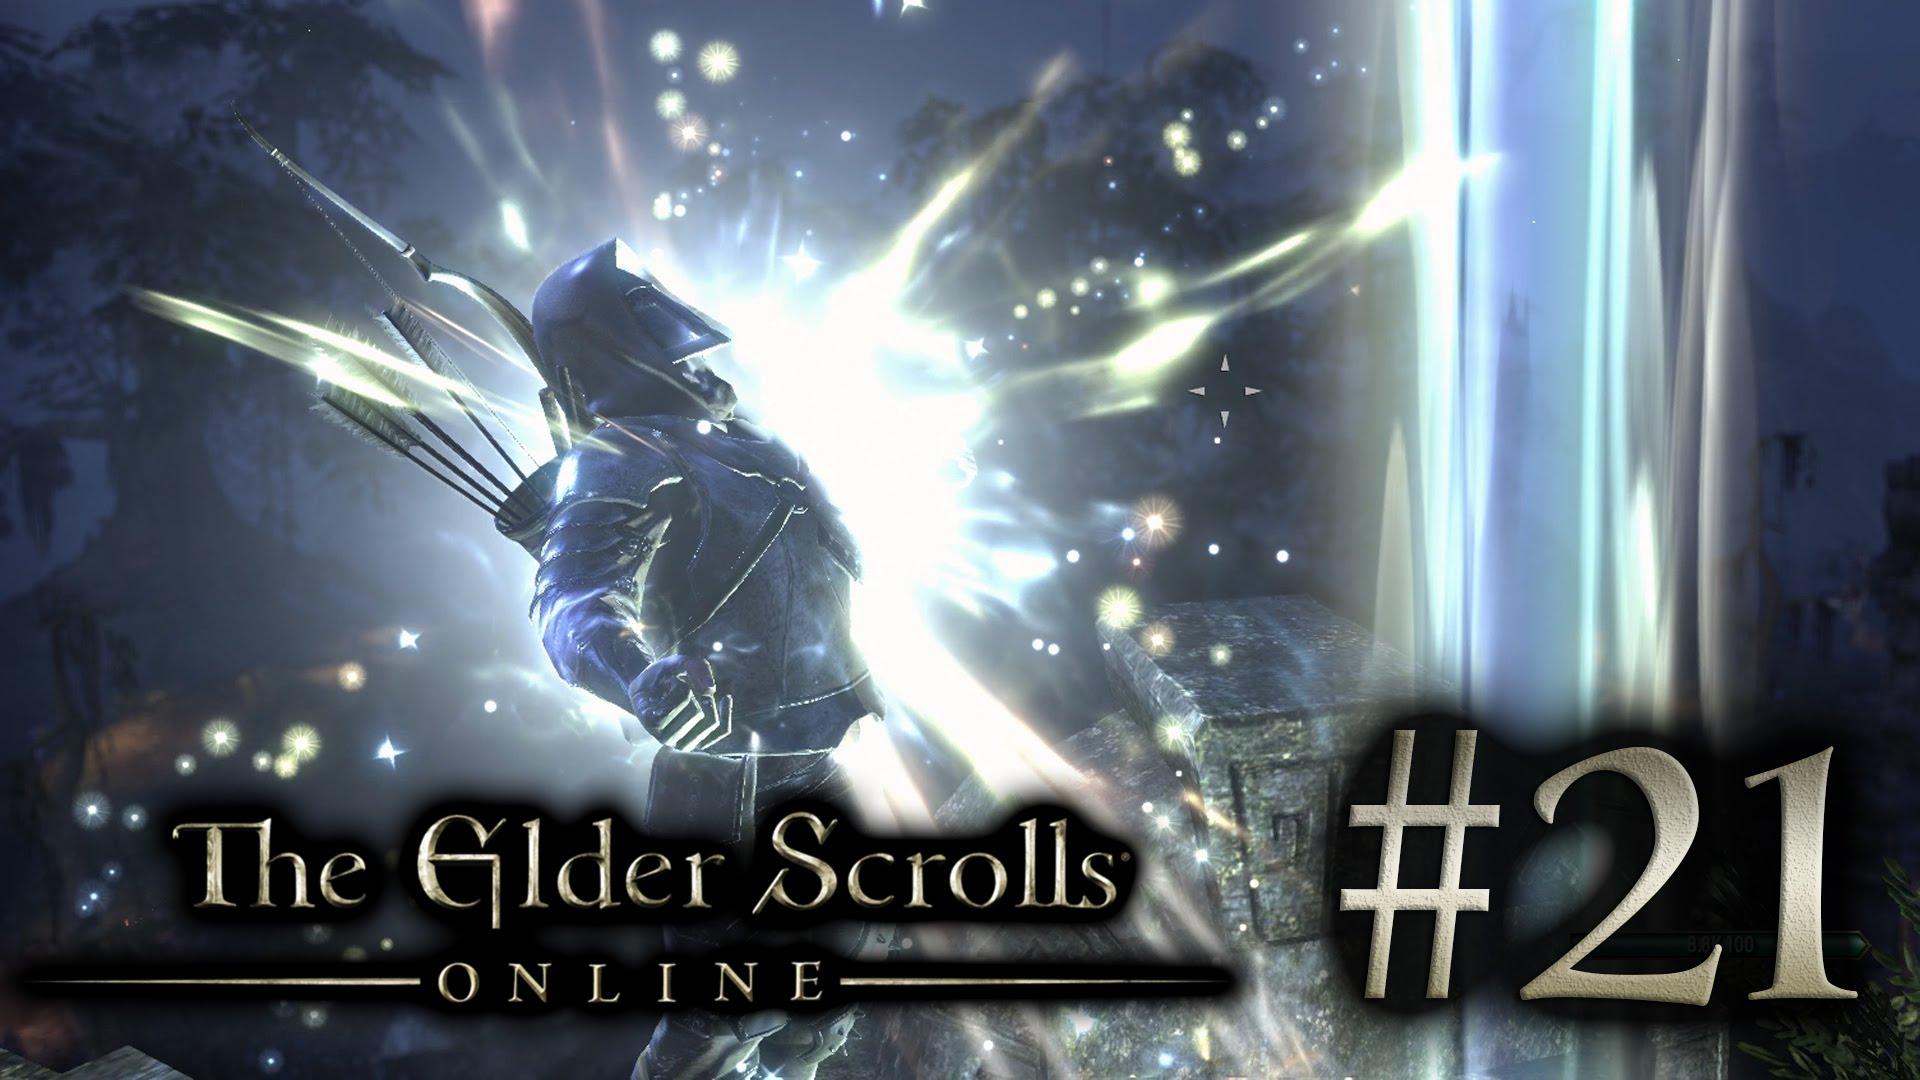 #21 The Elder Scrolls Online [エルダー・スクロールズ・オンライン]